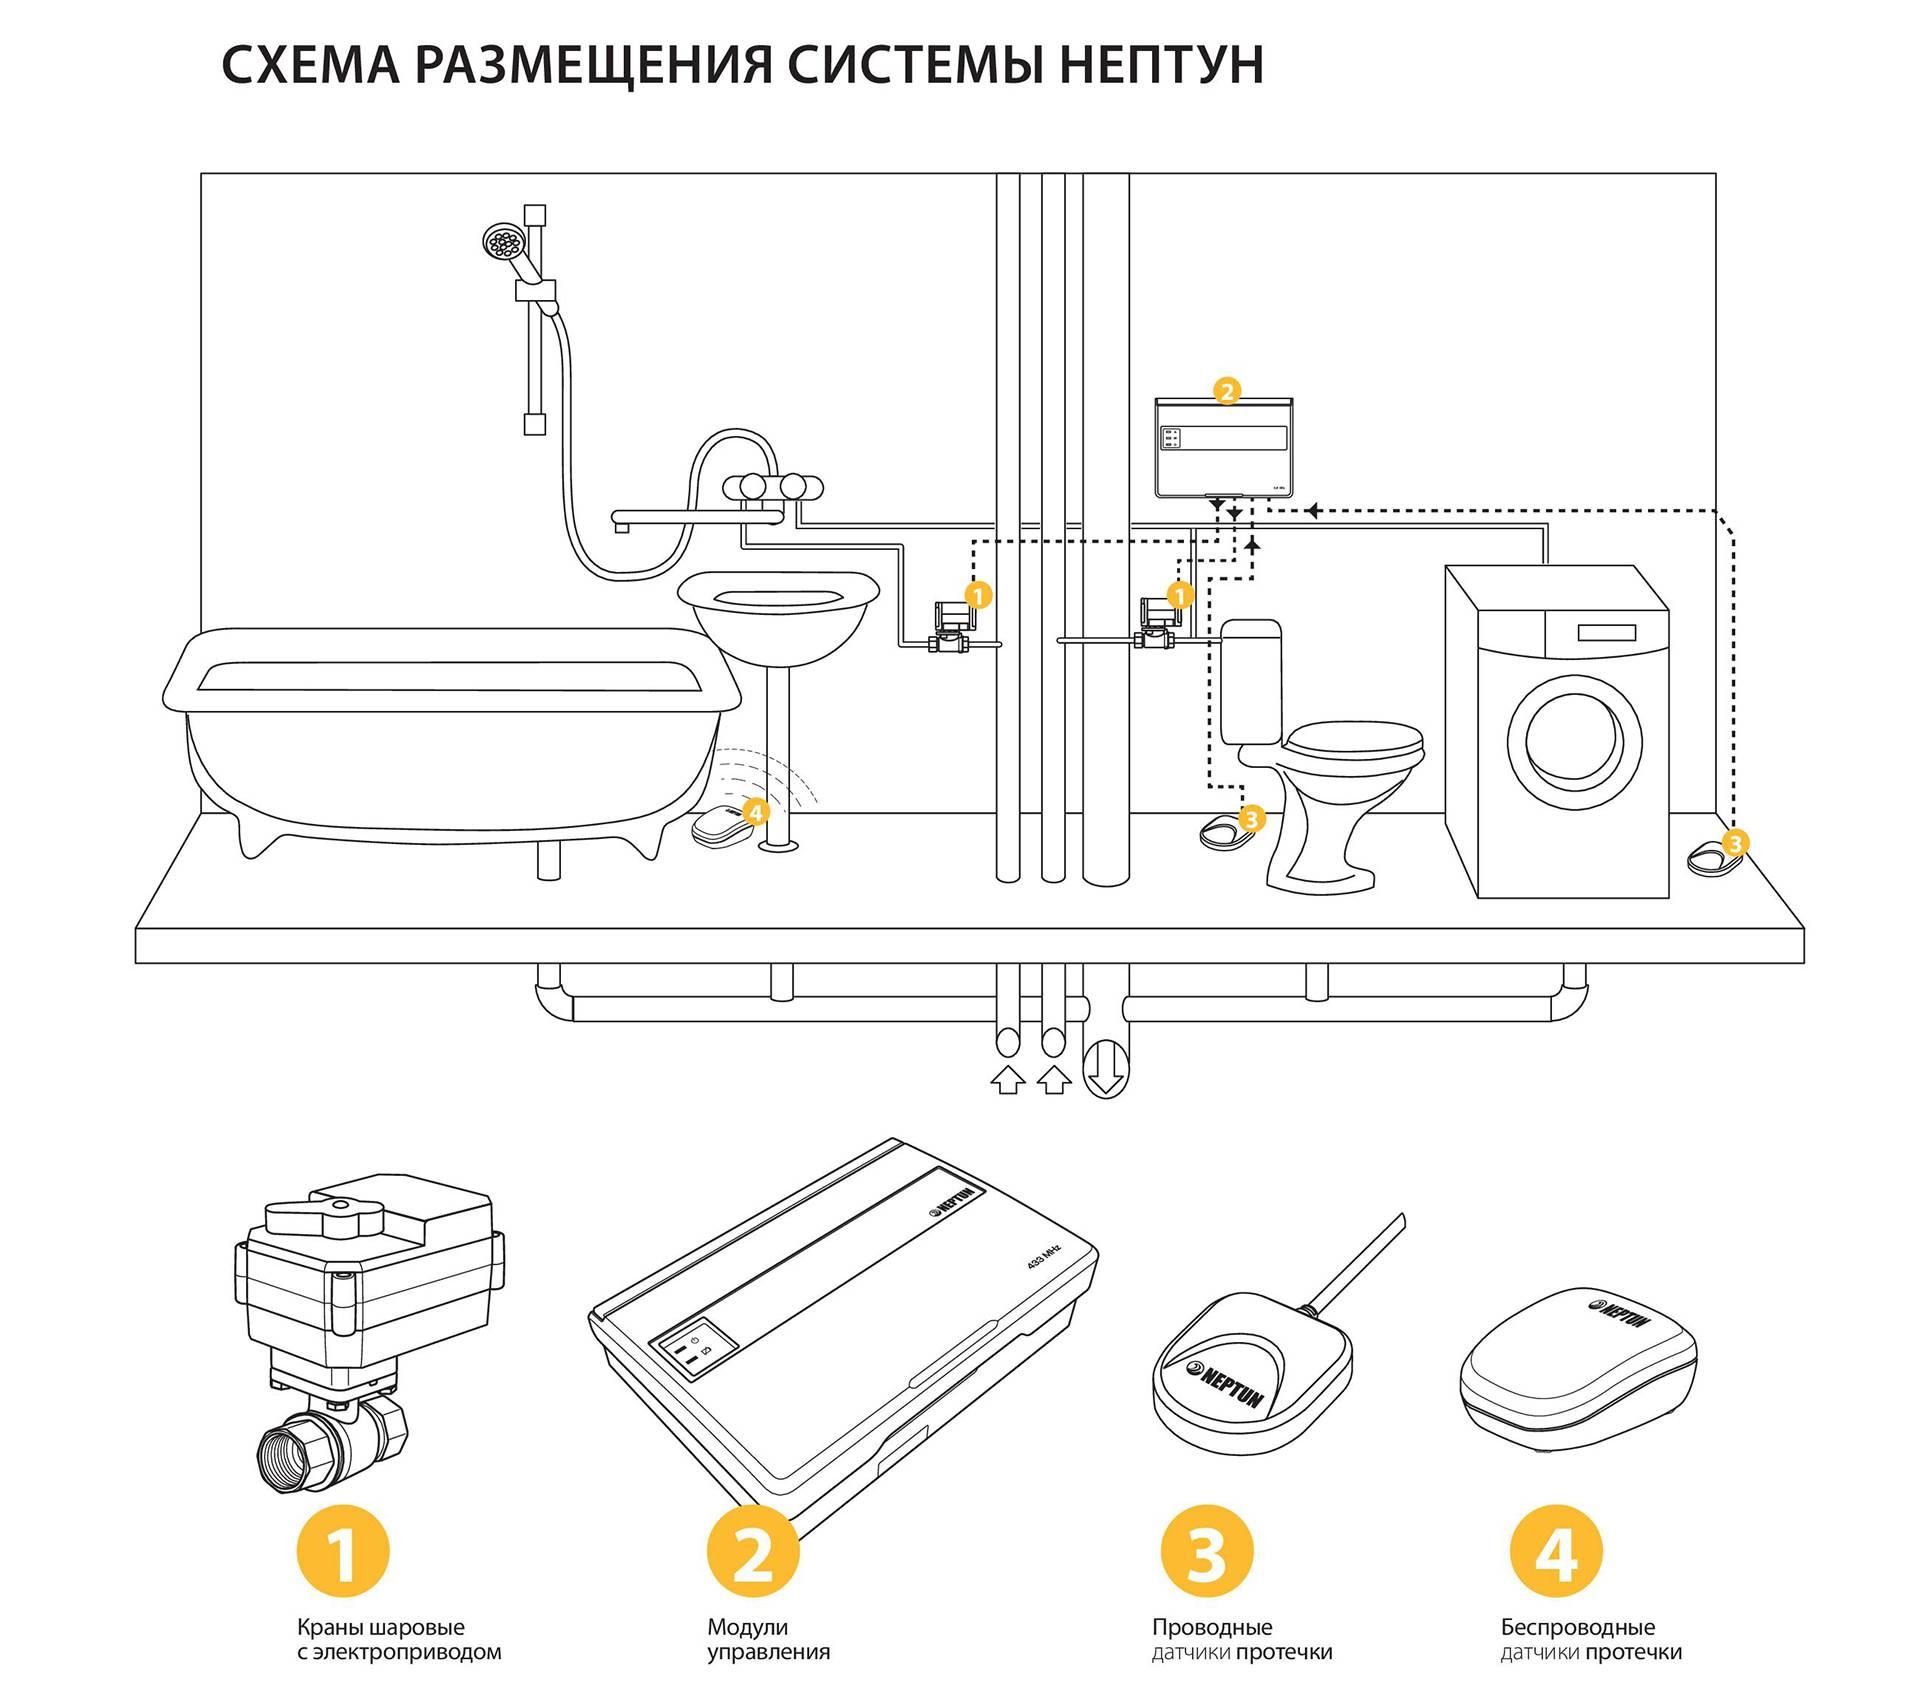 Система защиты от протечек «аквасторож» характеристика - самстрой - строительство, дизайн, архитектура.